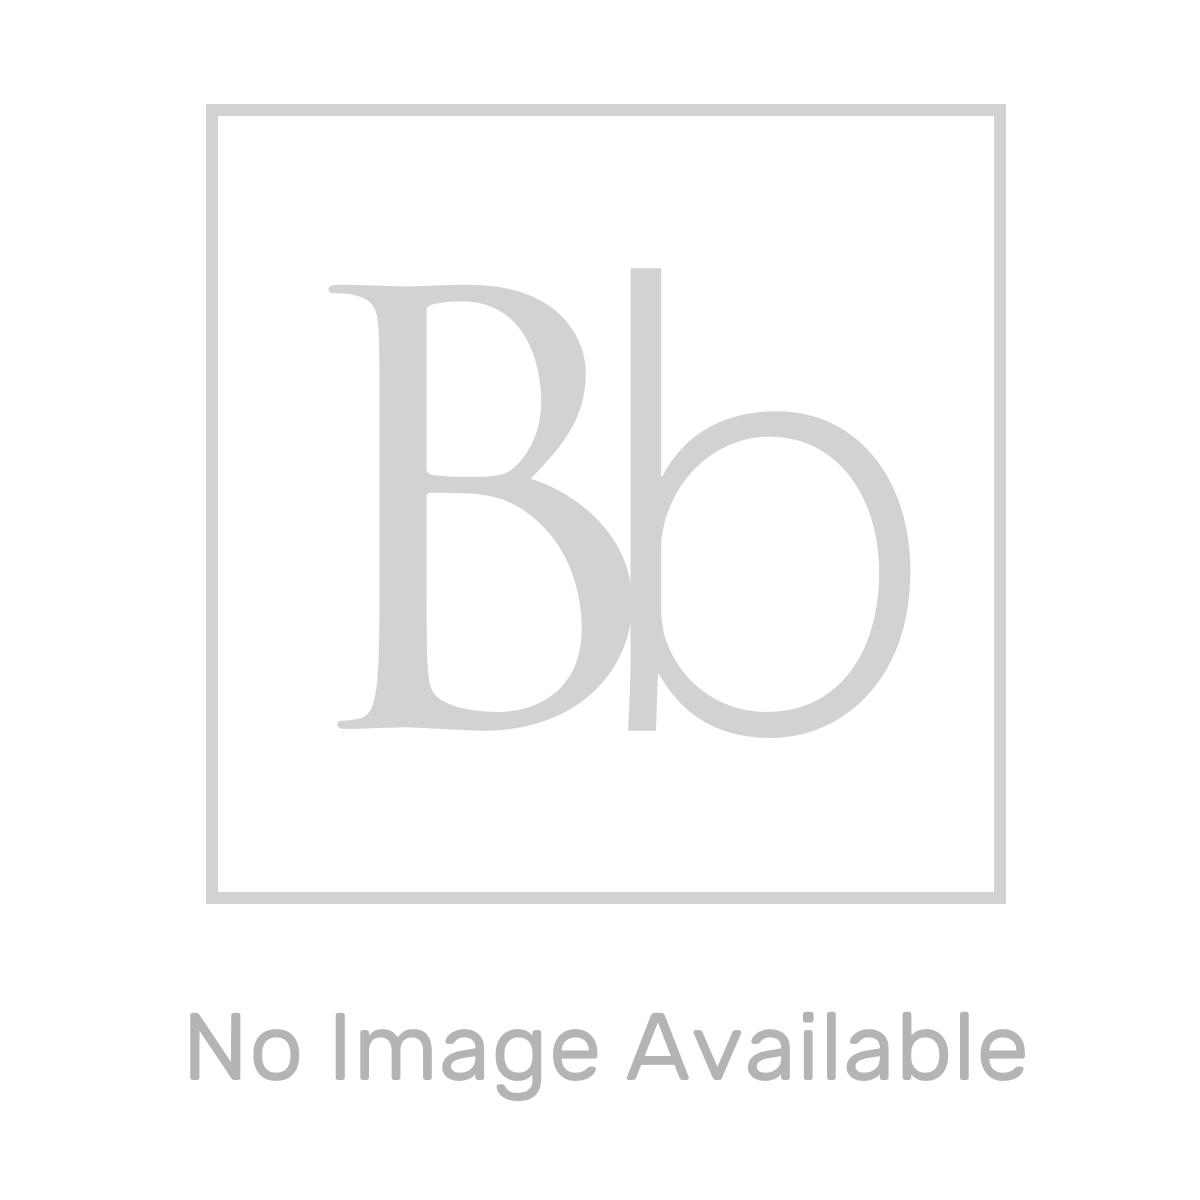 RAK Hades Heated LED Oval Mirror Line Drawing